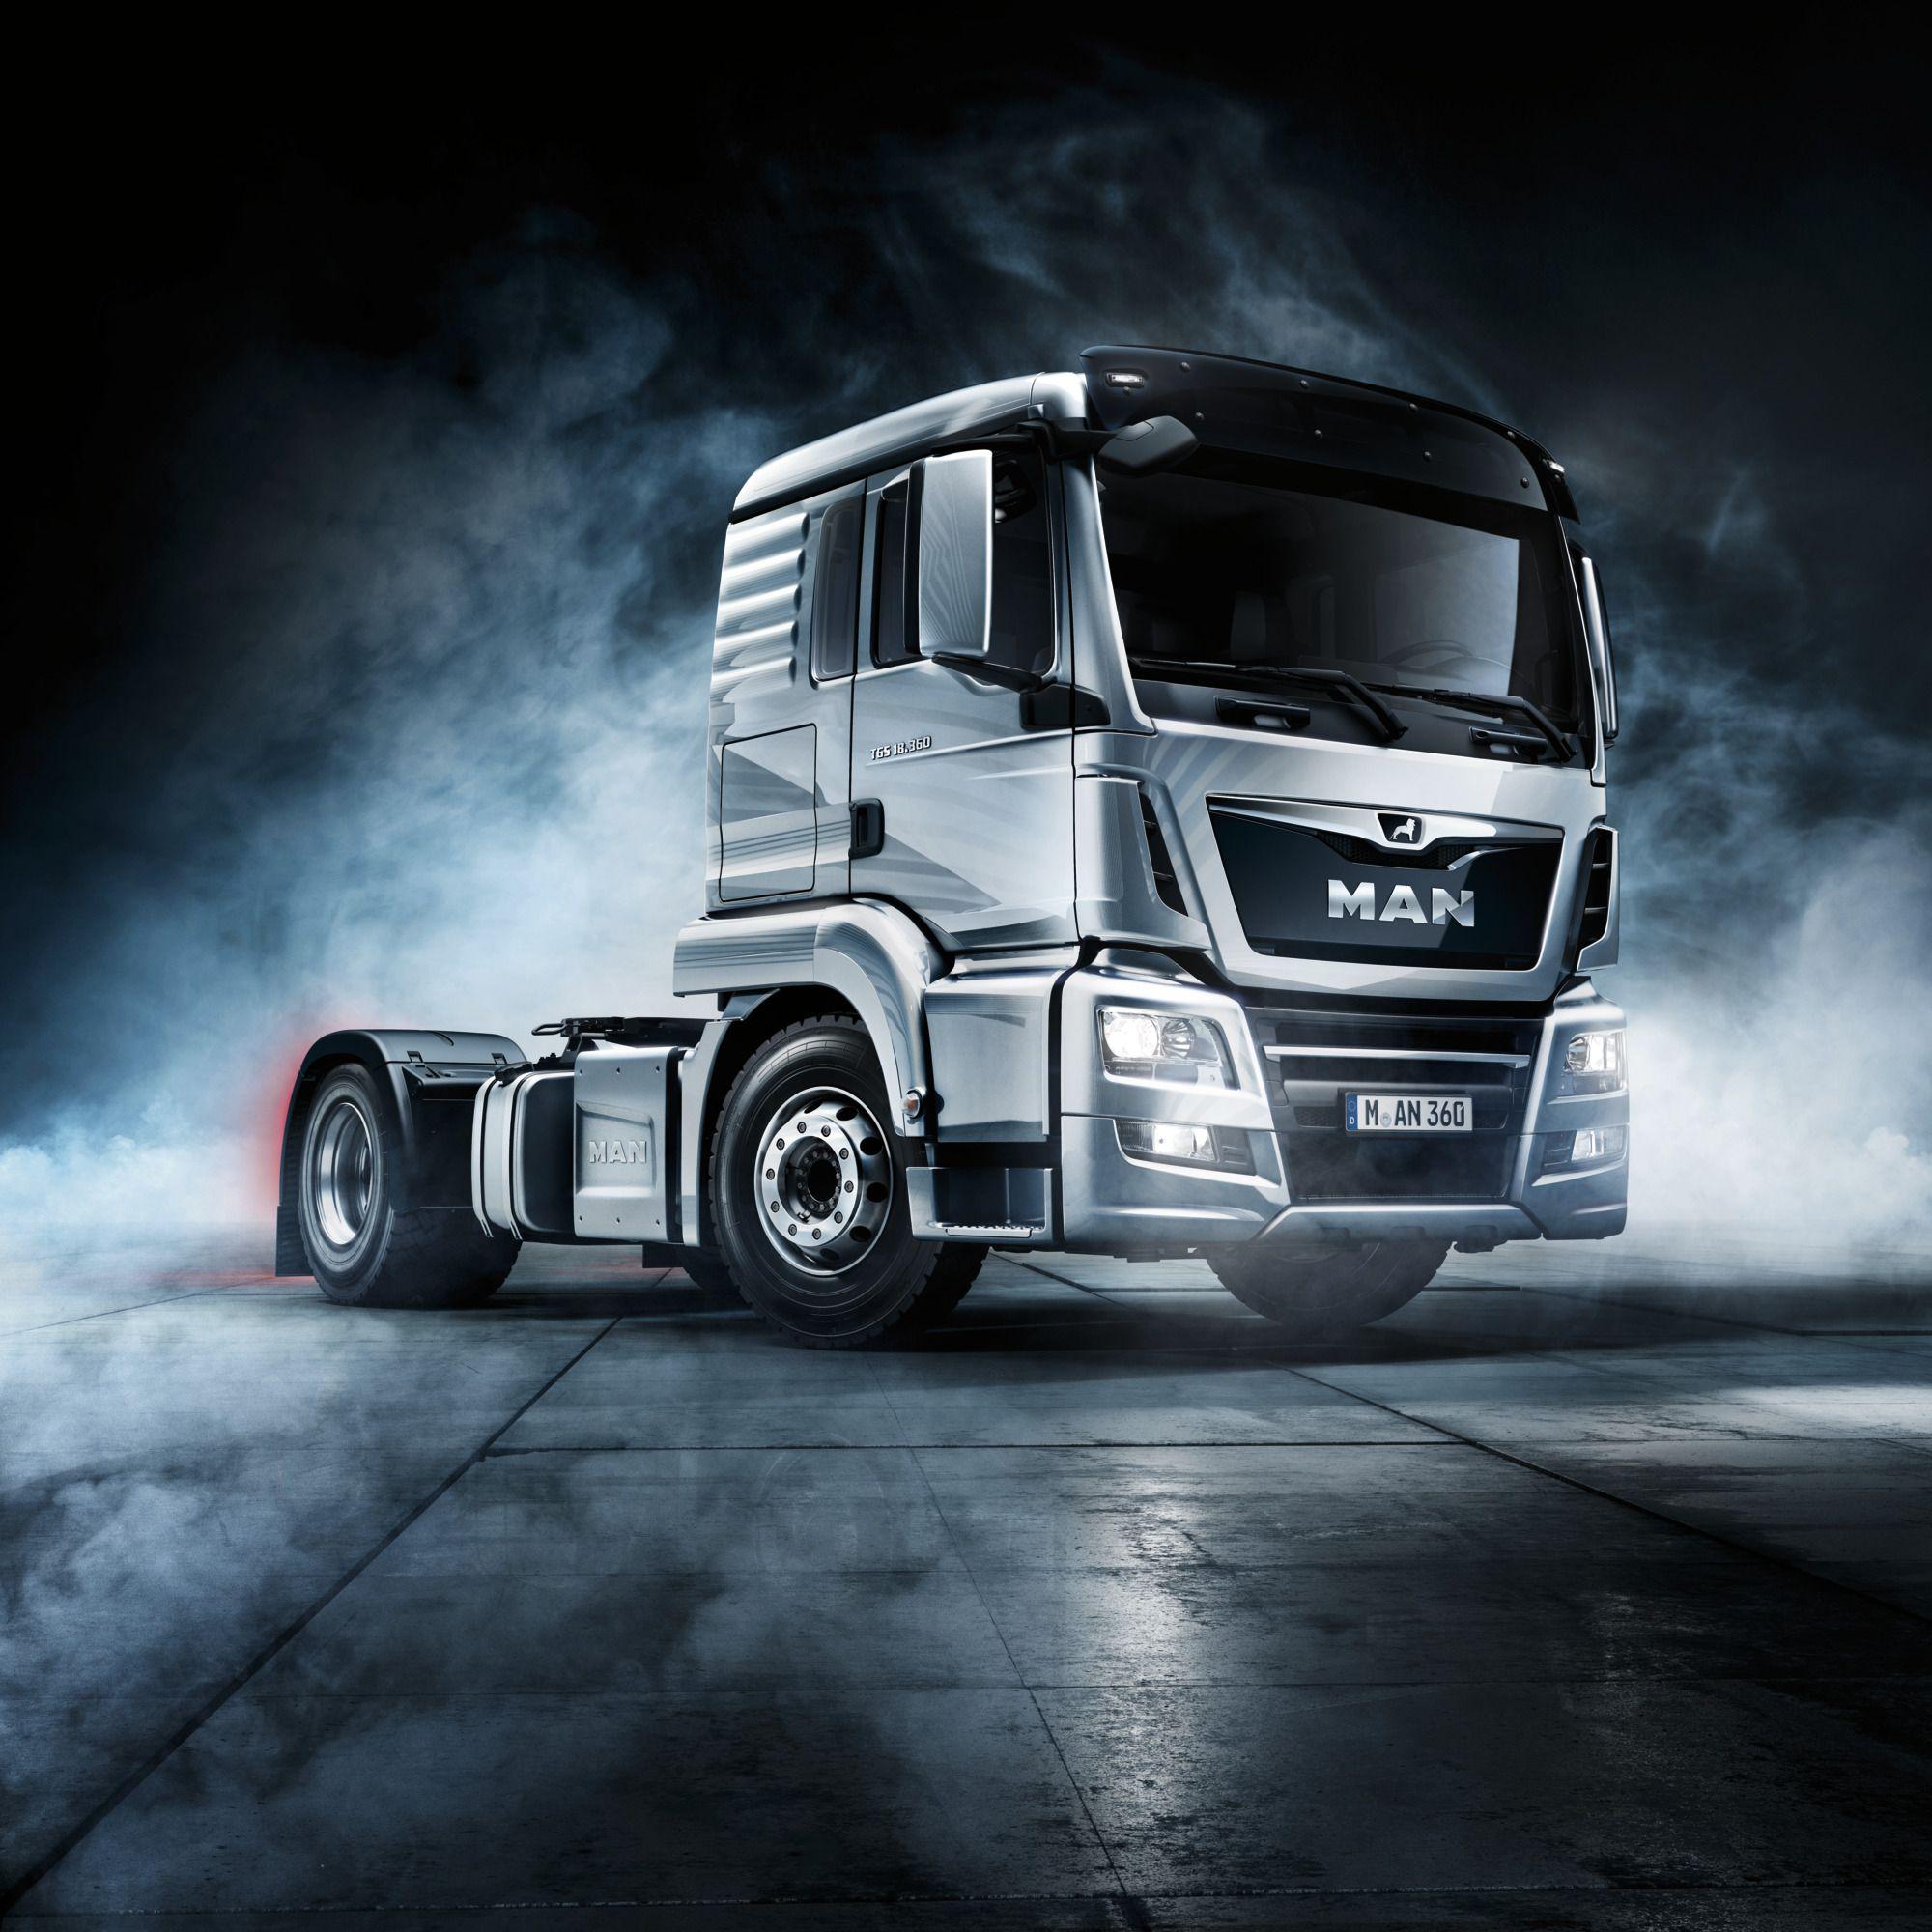 MAN Truck Wallpapers   Top MAN Truck Backgrounds 2000x2000